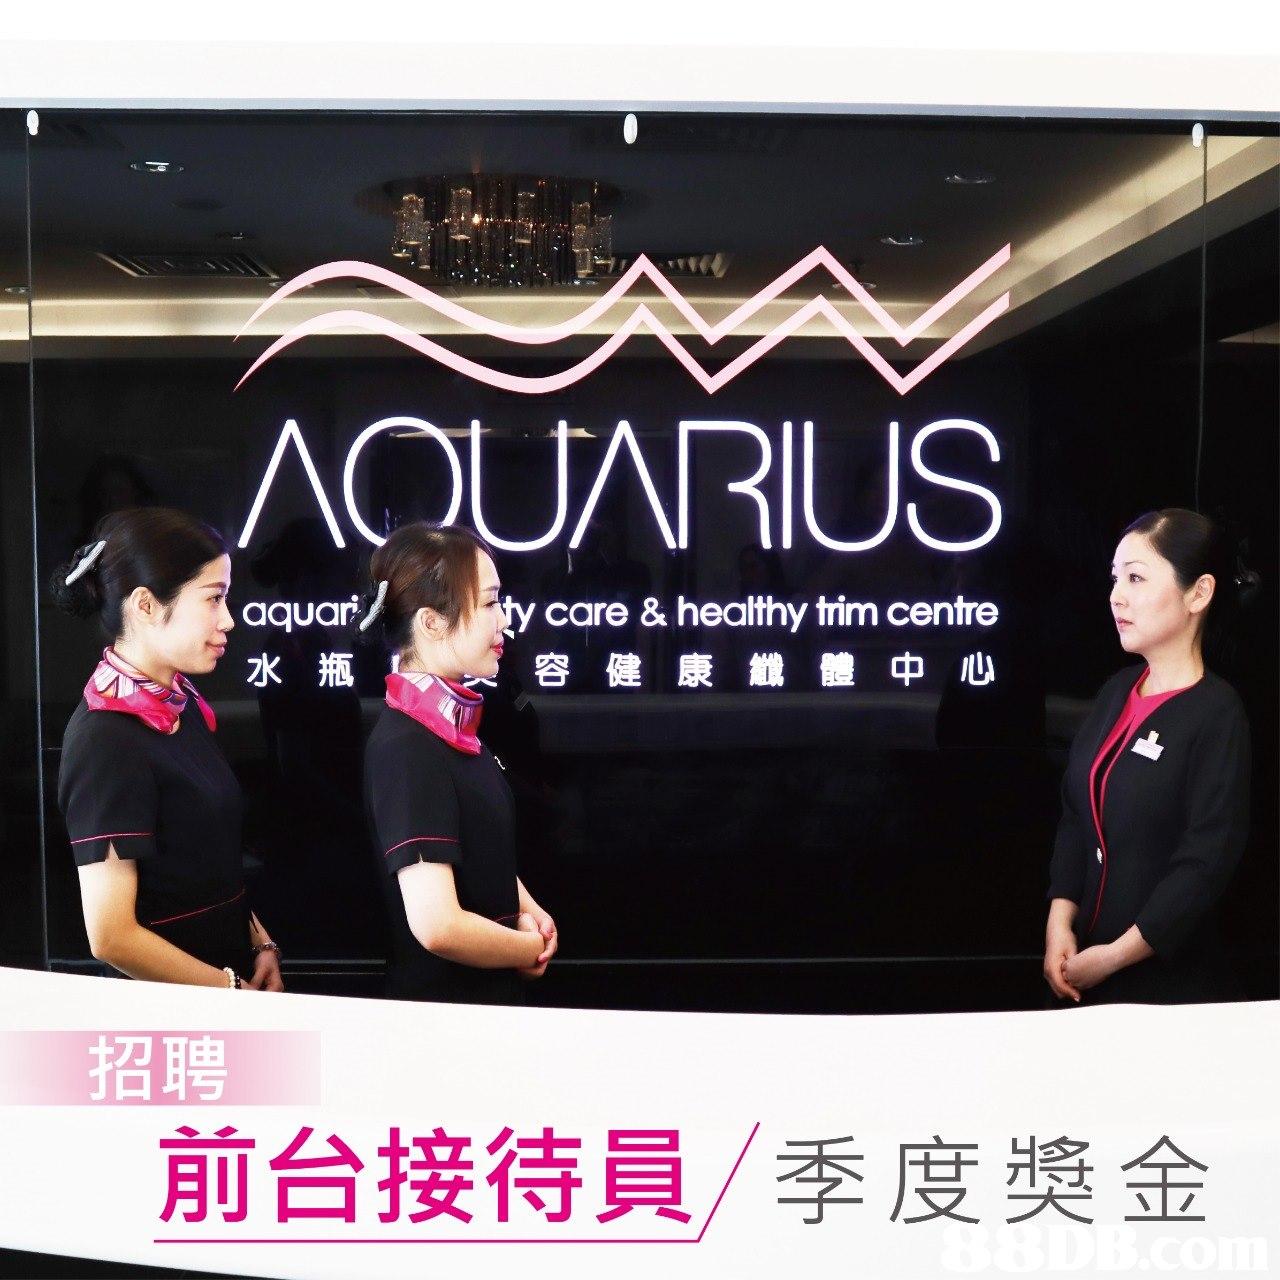 AQUARIUS aquar/y care & healthy trim centre 水瓶 容健康畿體中心 招聘 前台接待員/季度奬金  Font,Stage,